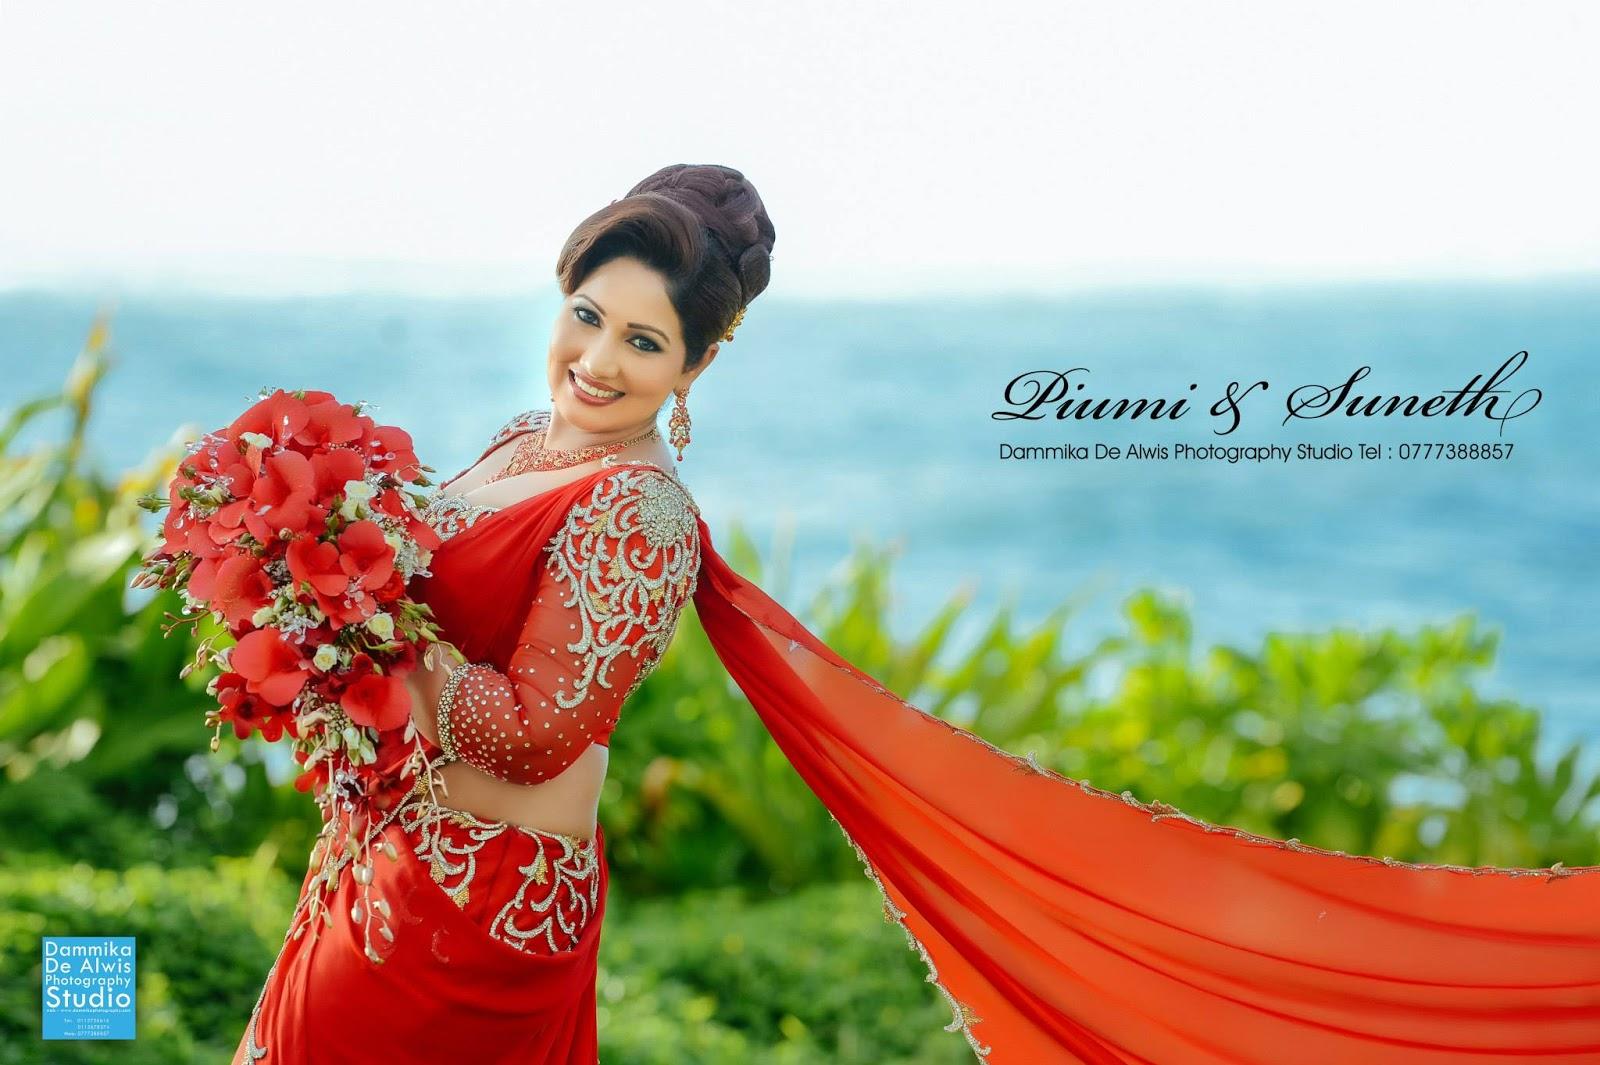 Piyumi Botheju | Sri Lankan Actress latest image